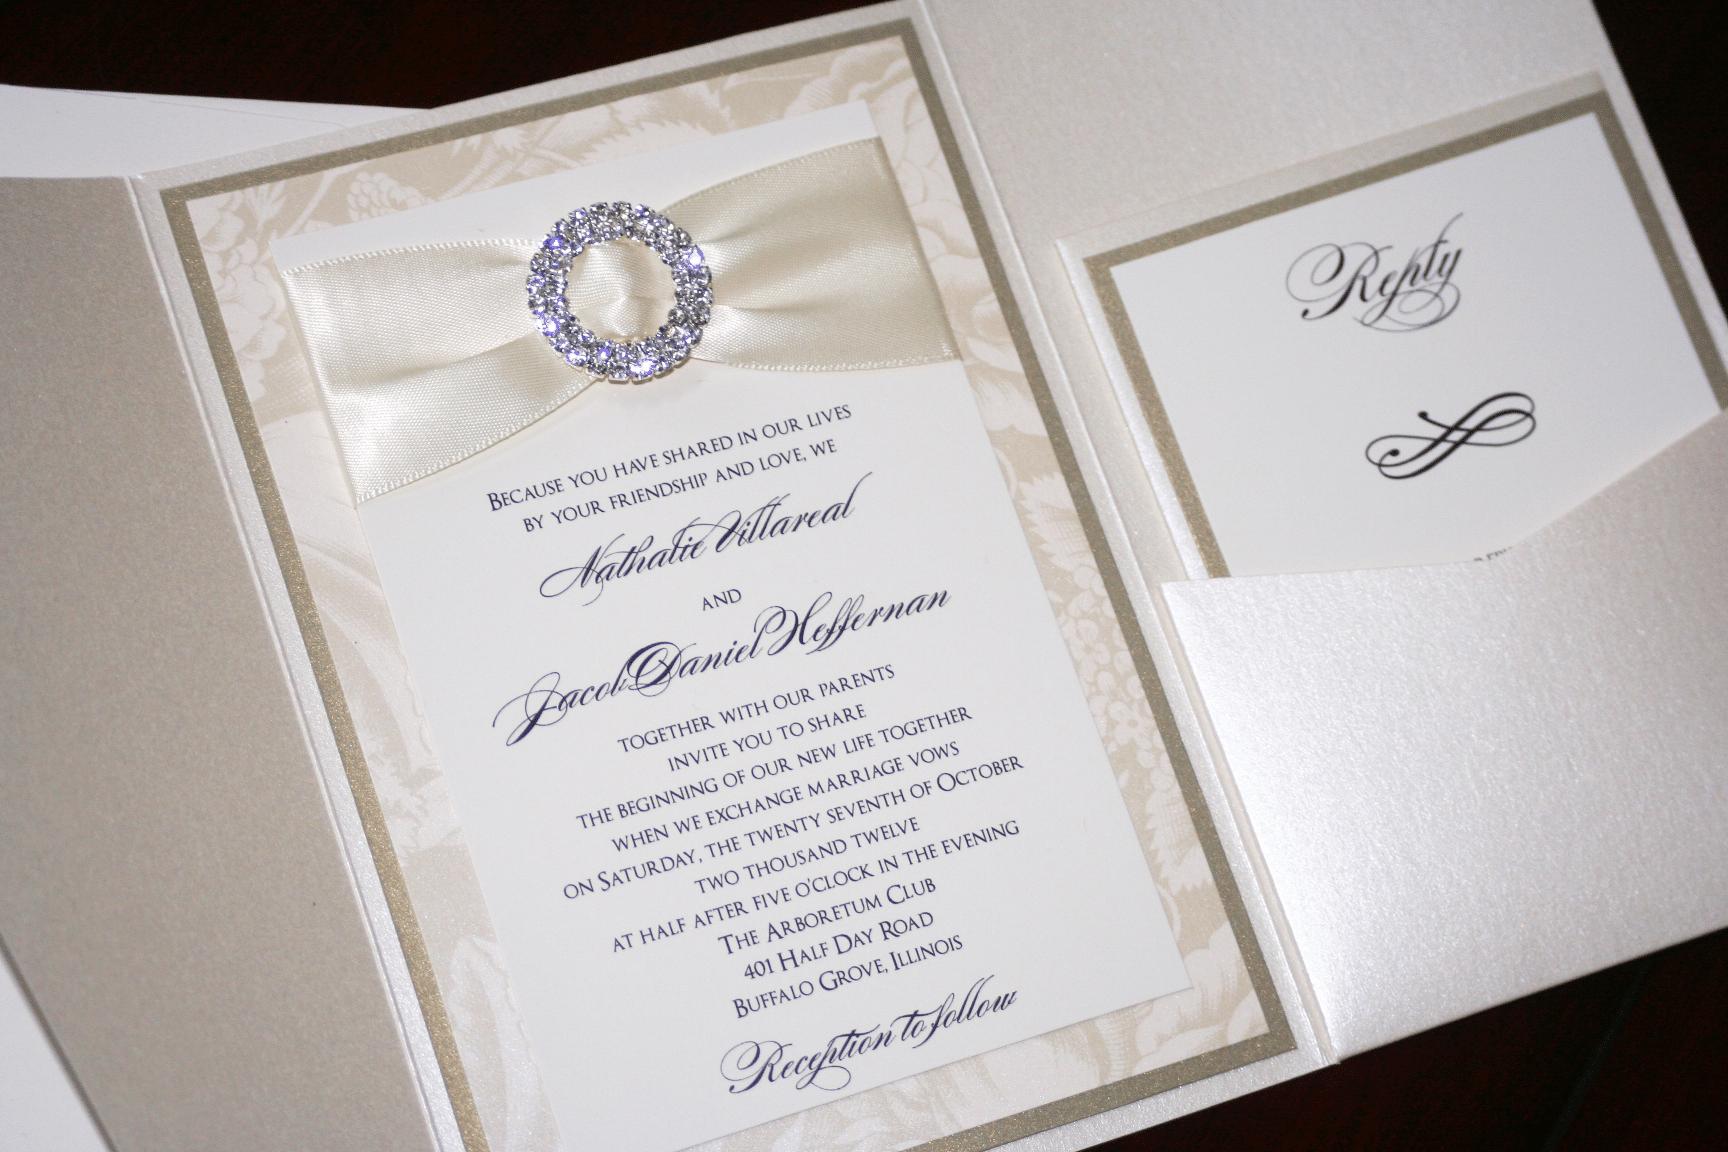 wedding invitations canada - 28 images - wedding invitations canada ...